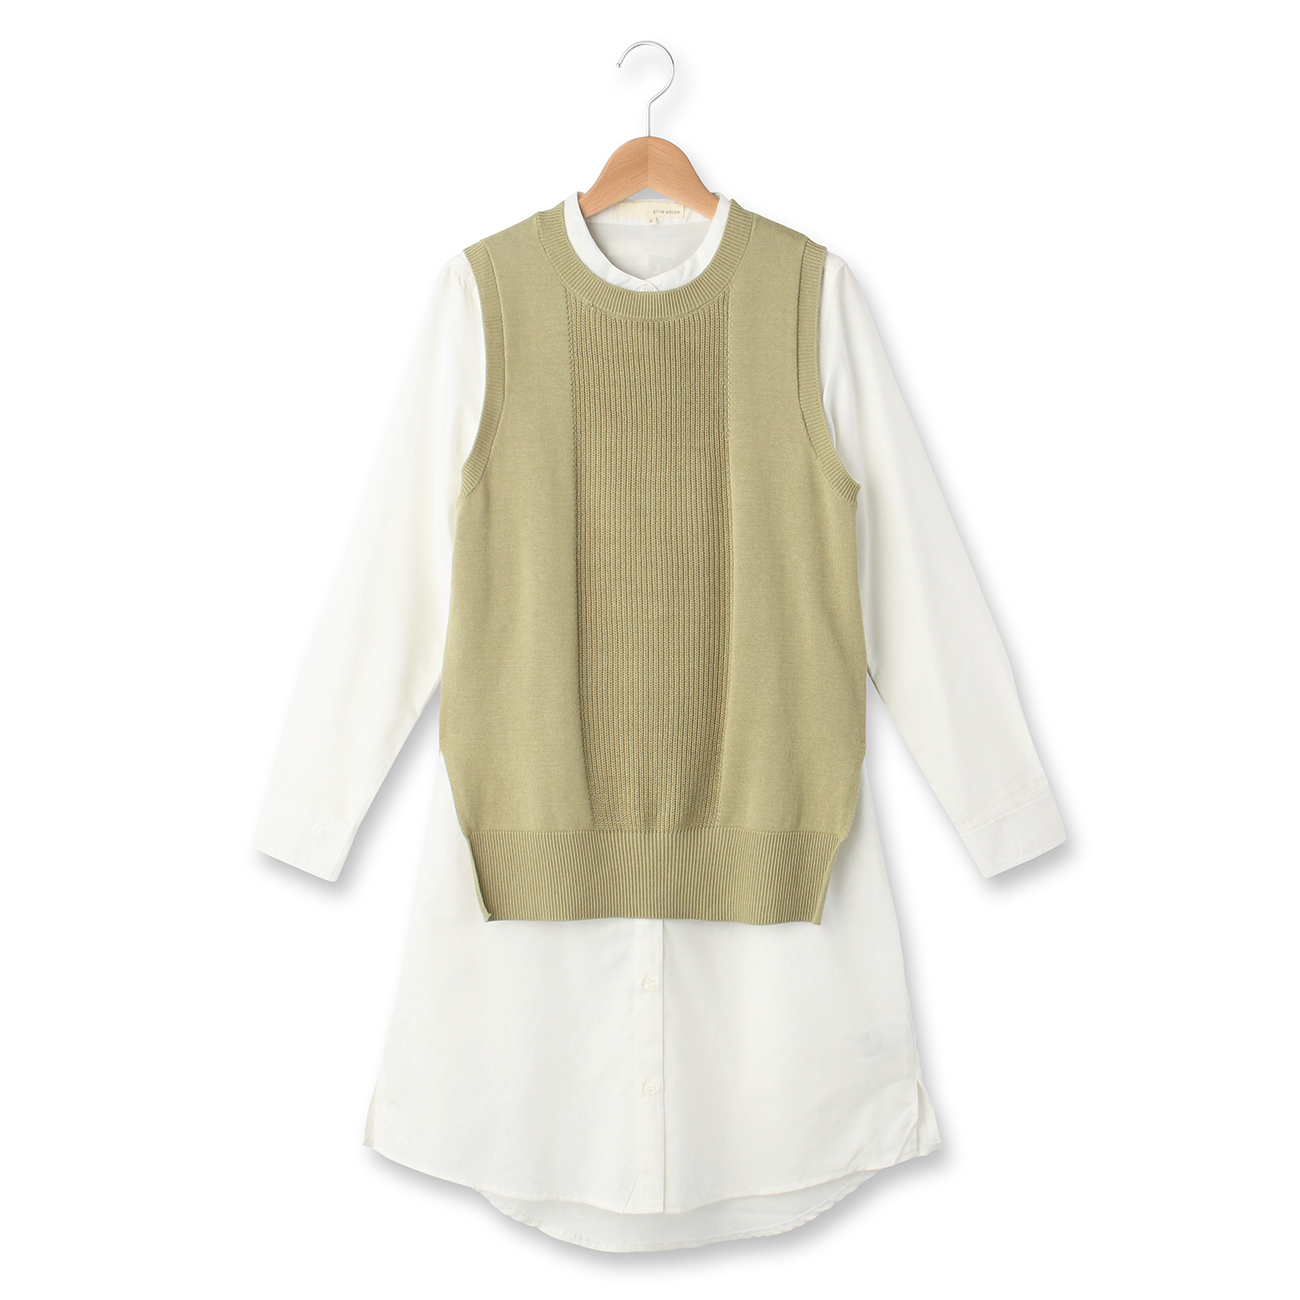 【pink adobe (ピンクアドベ)】ベスト×スタンドカラーシャツSETワンピースレディース ワンピース|ワンピース オフホワイト